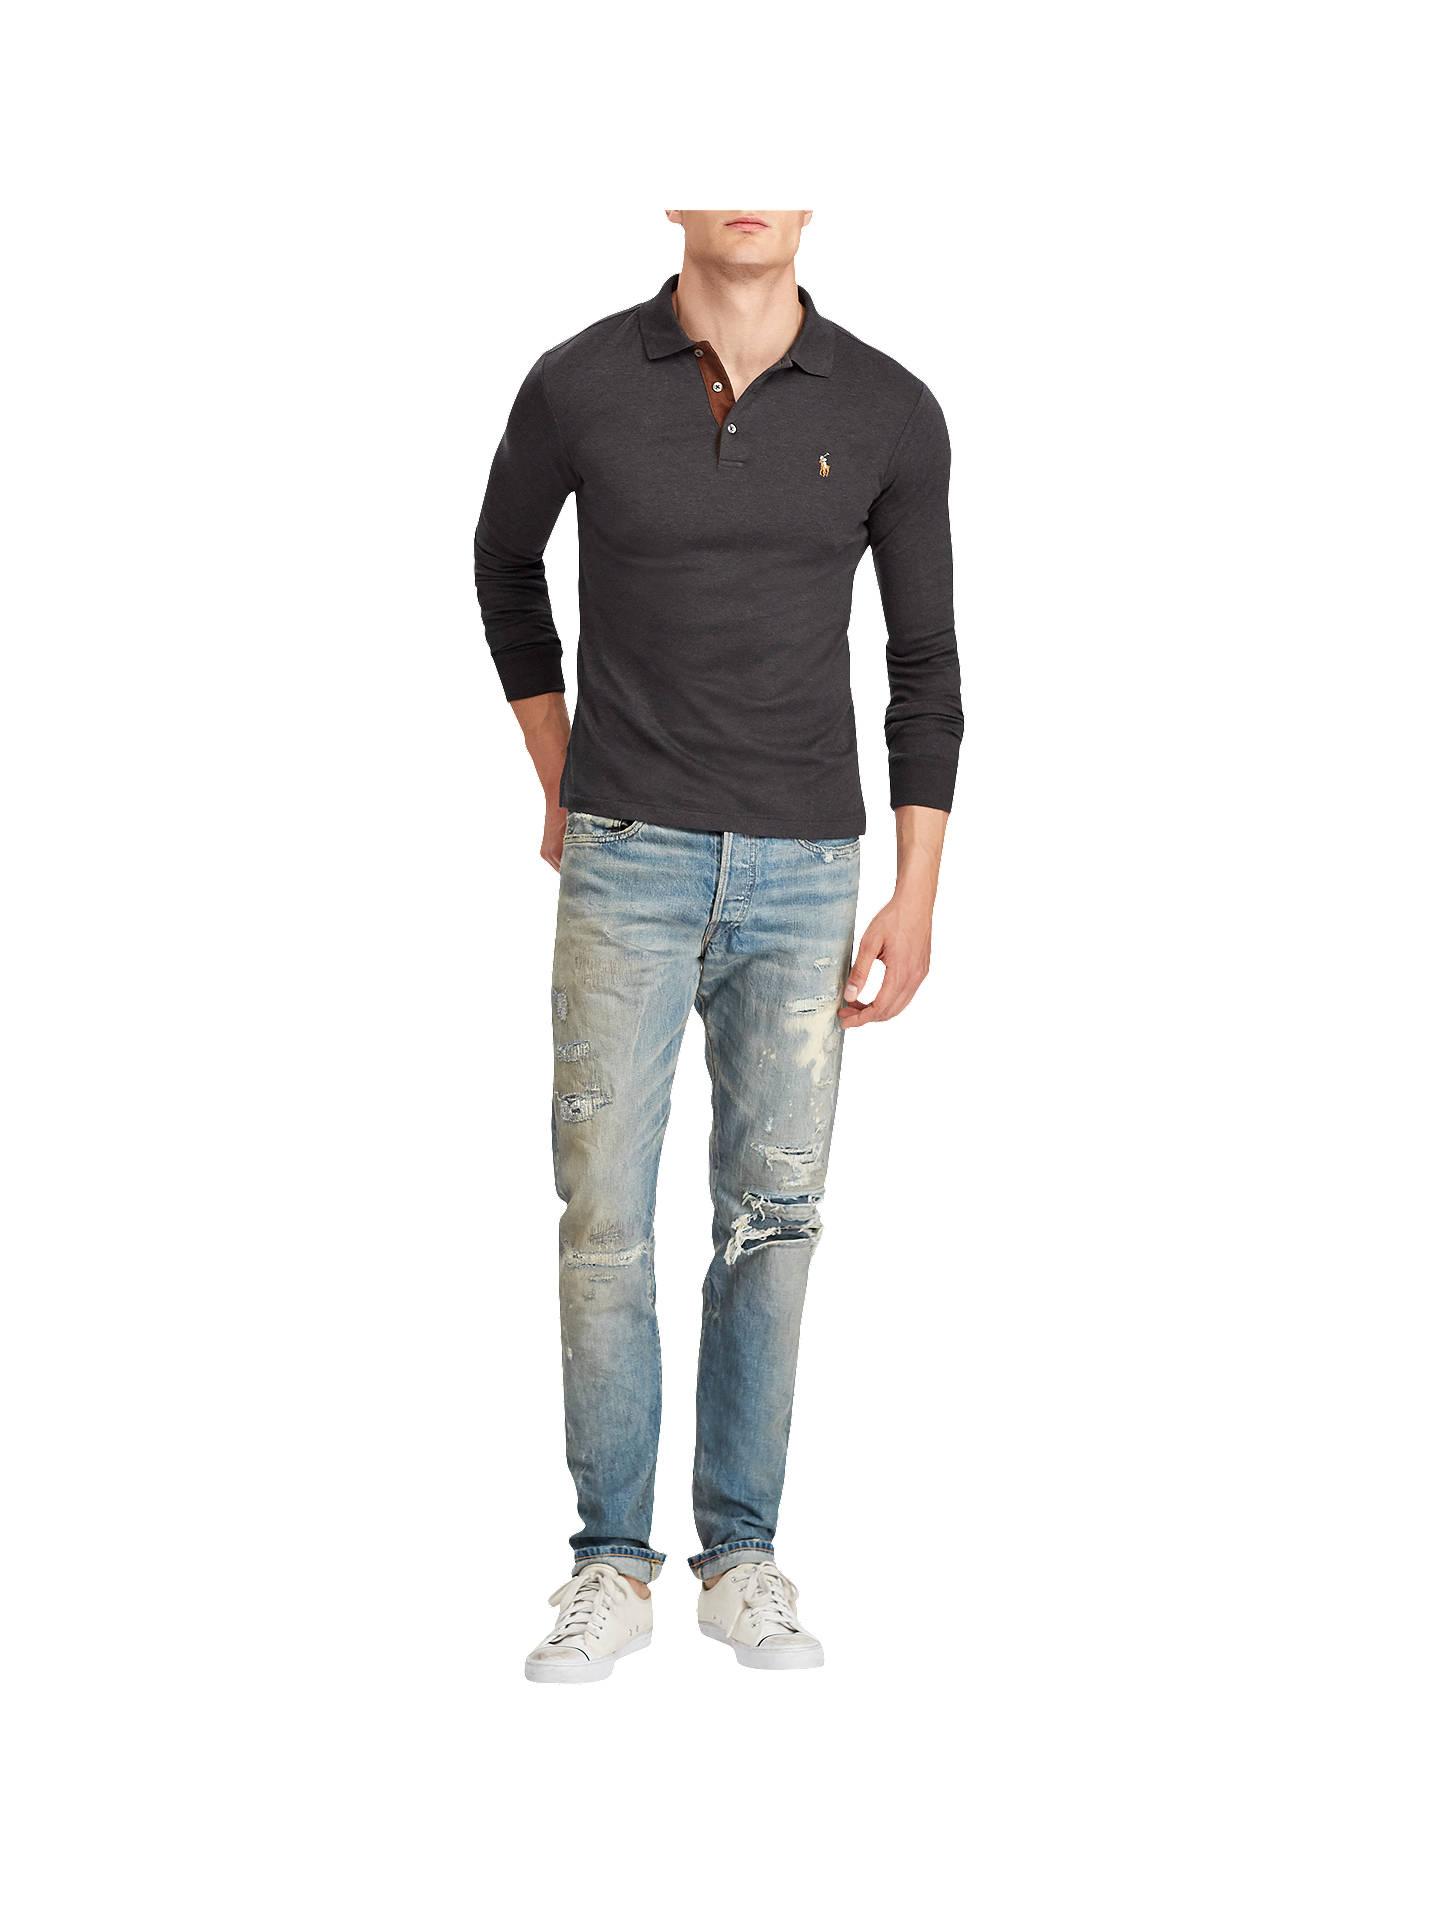 091f0674 Polo Ralph Lauren Long Sleeve Mesh Polo Shirt, Dark Granite Heather ...